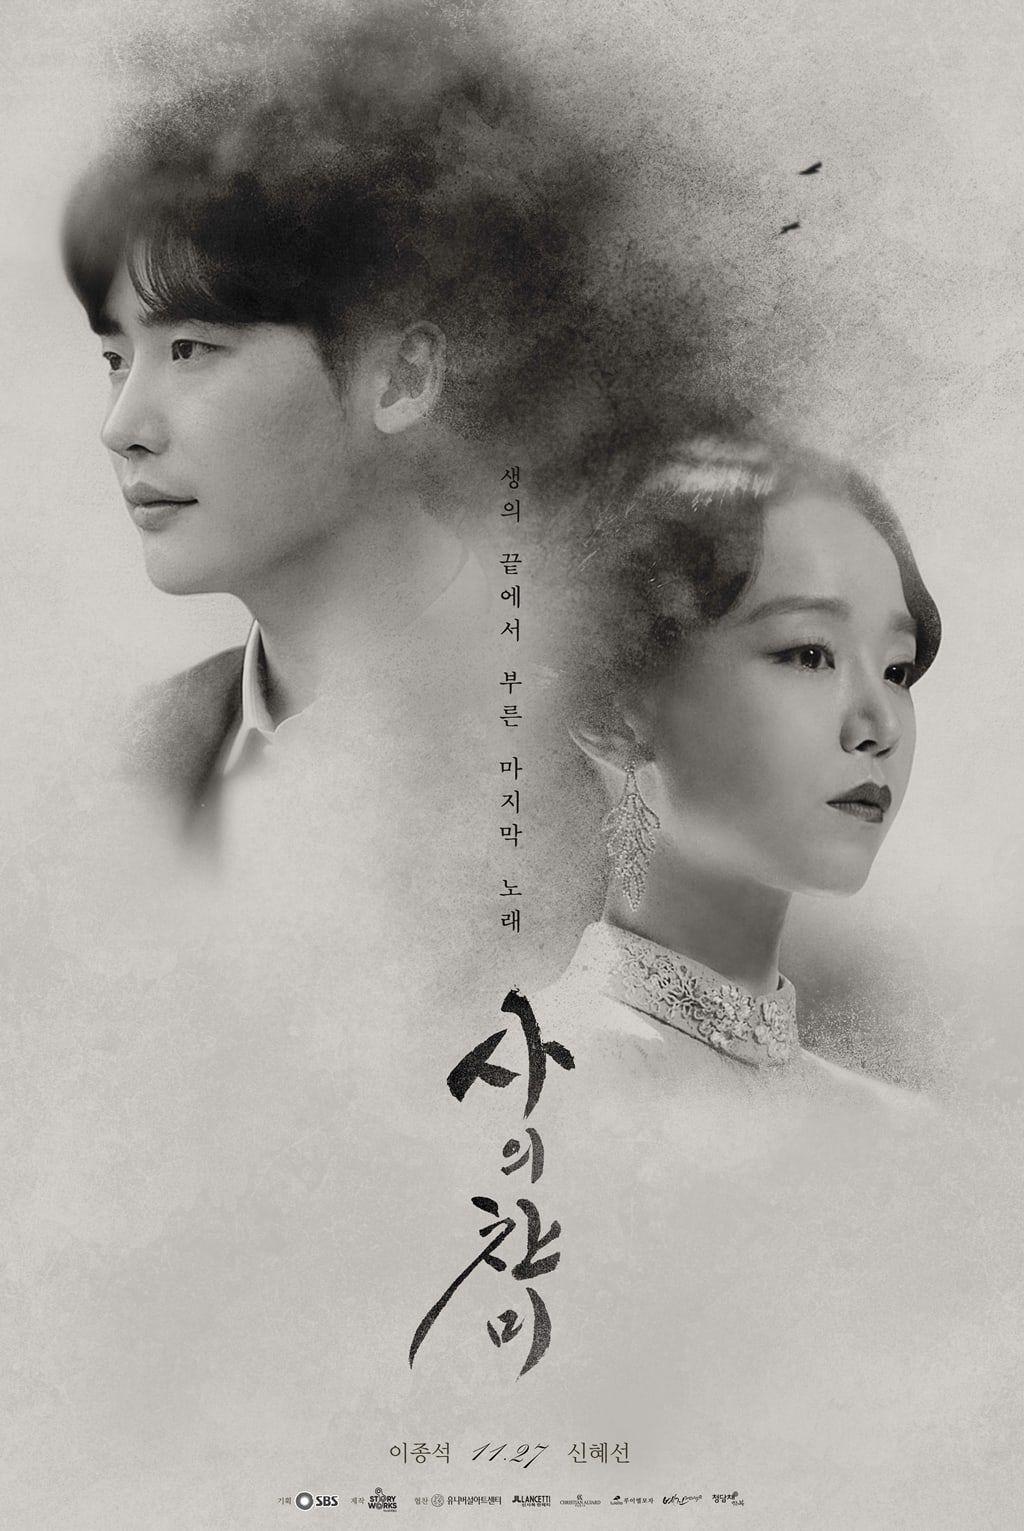 سریال کره ای سمبل مرگ 2018